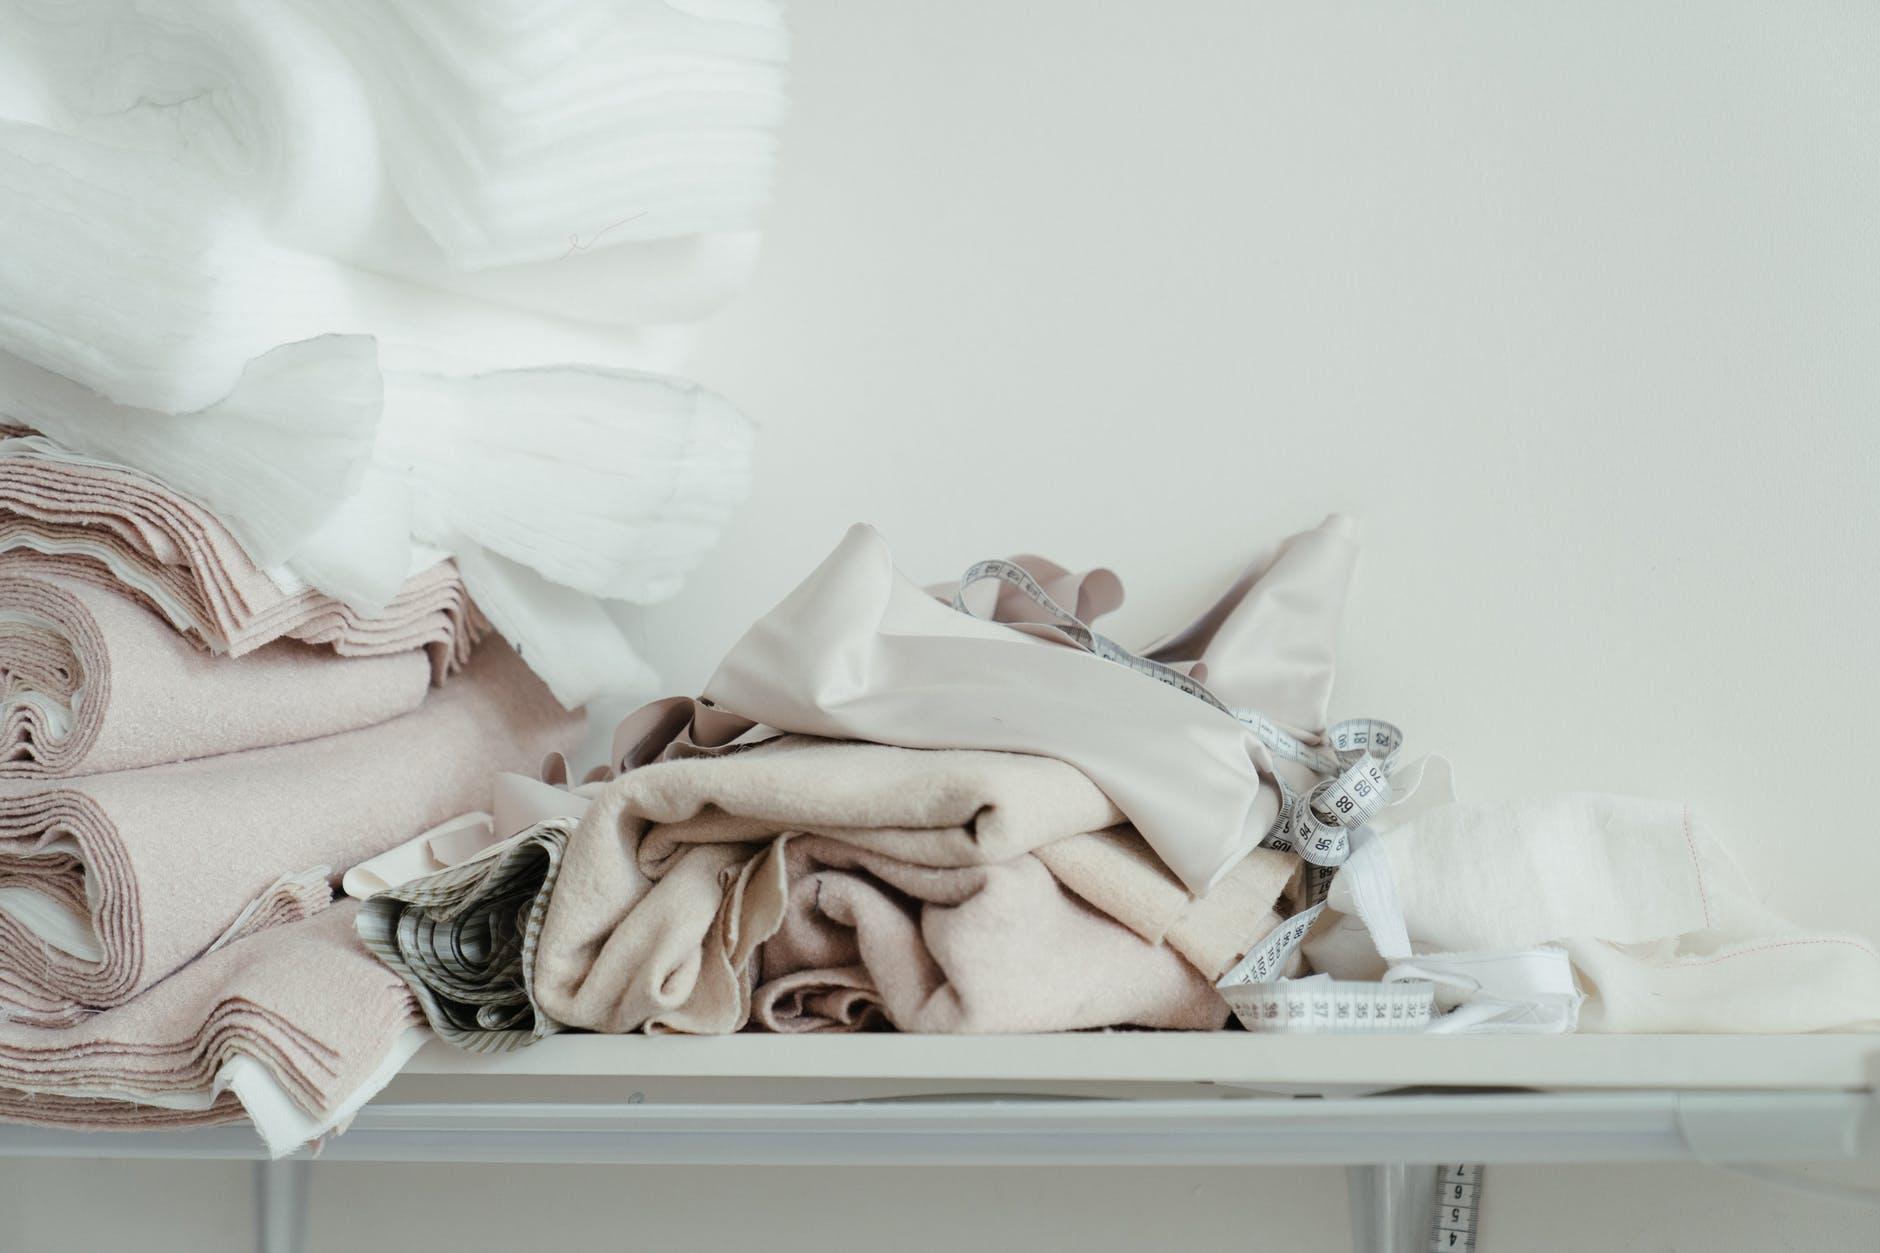 felt fabrics bundled on top of a table